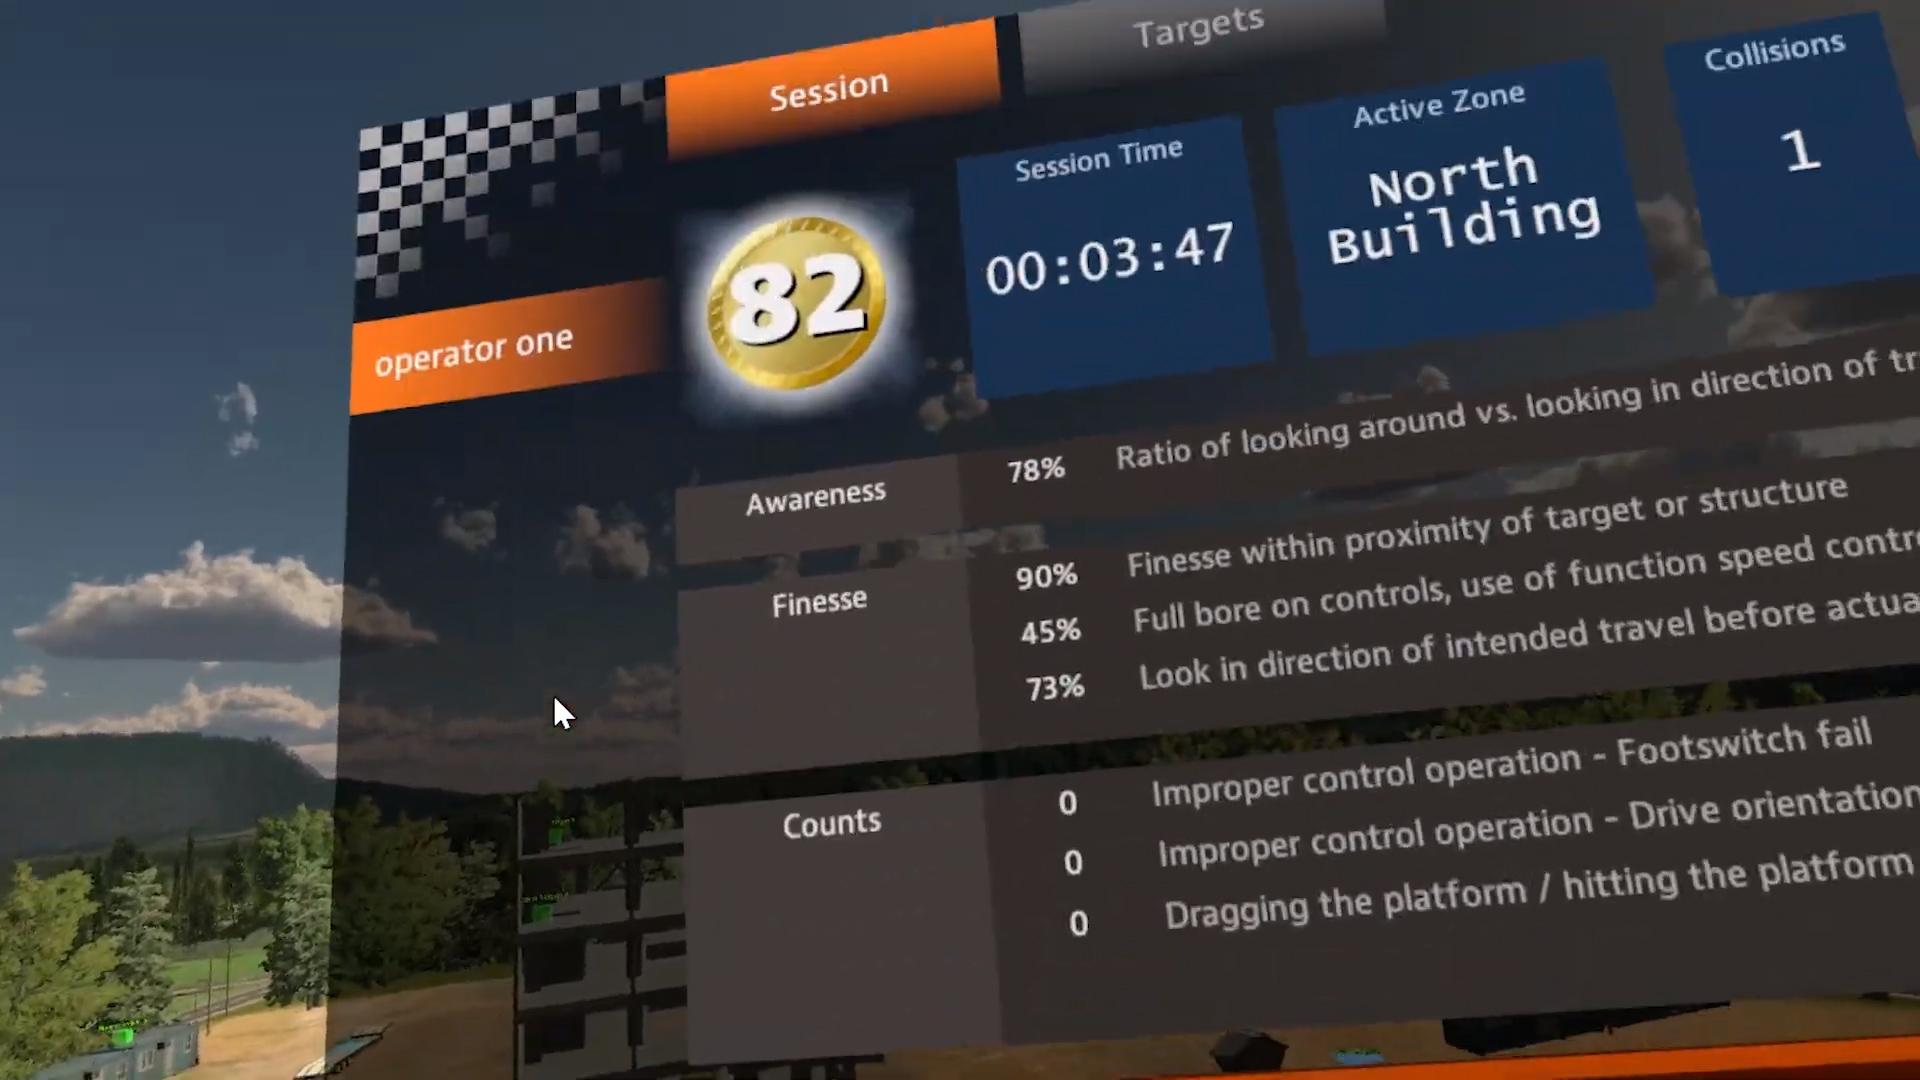 JLG AccessReady Fusion XR VR Training Simulator Session Results